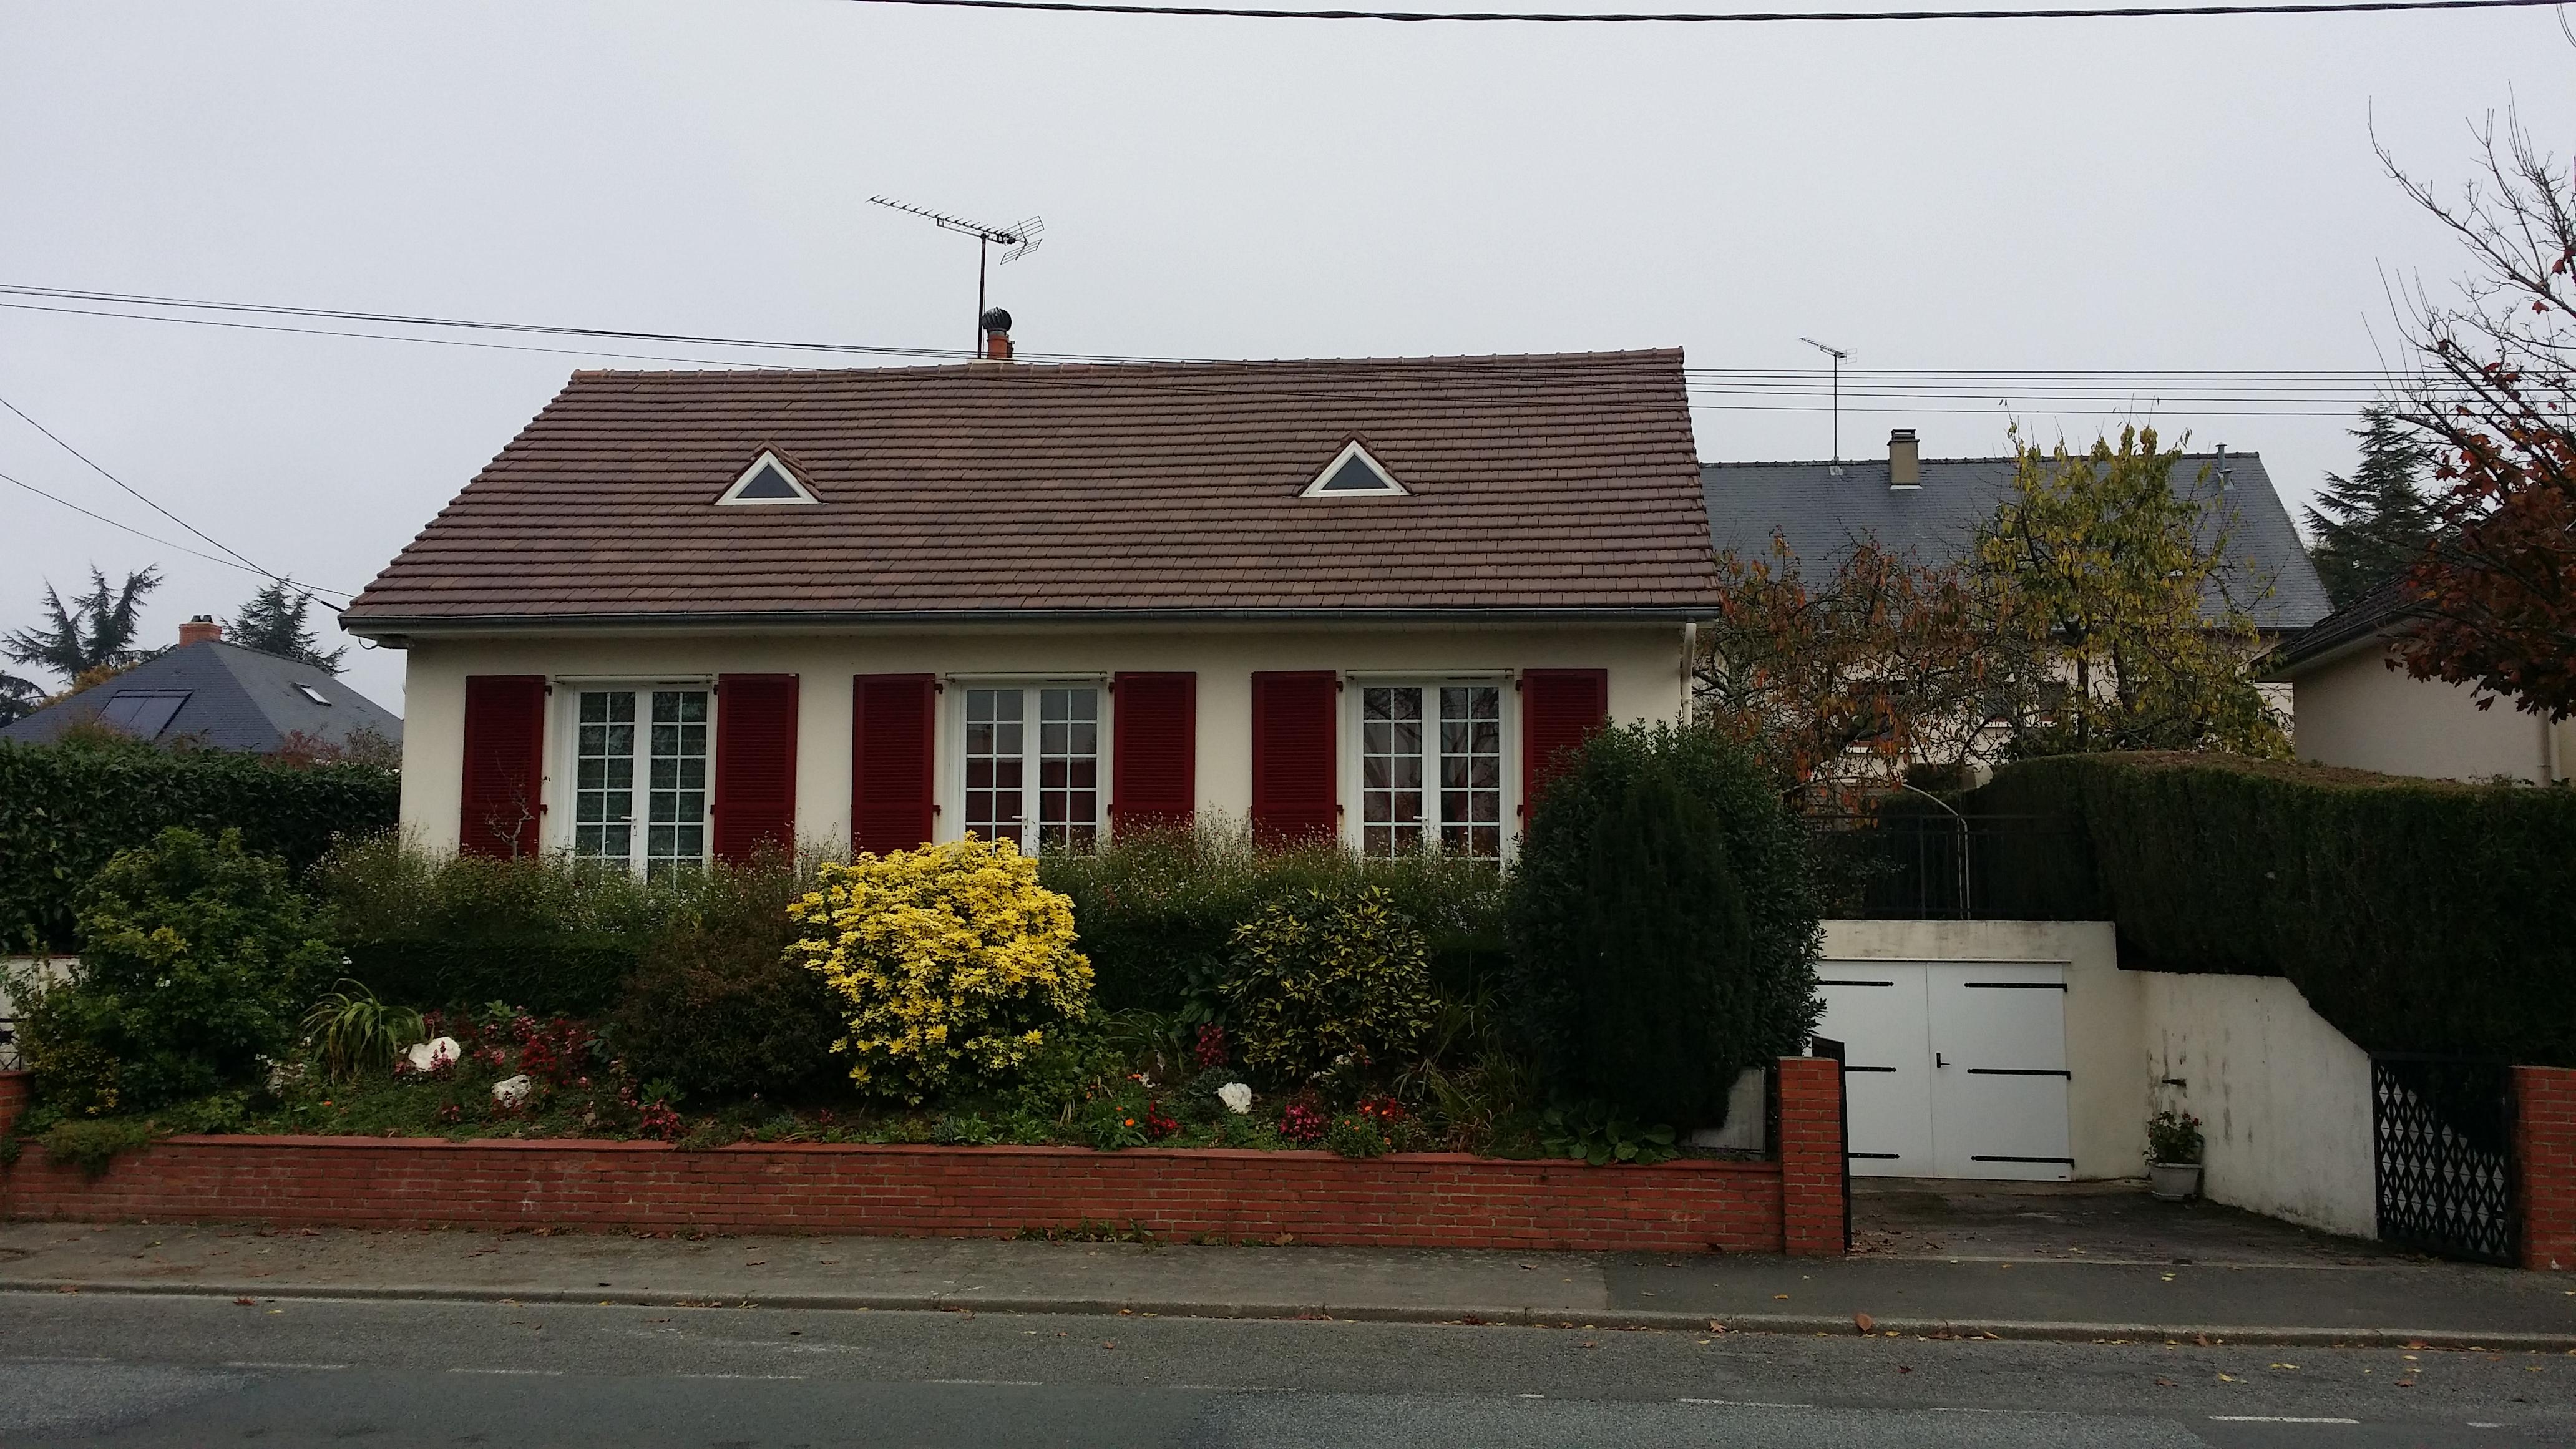 nettoyage toiture tuile beton great dclins sous le. Black Bedroom Furniture Sets. Home Design Ideas